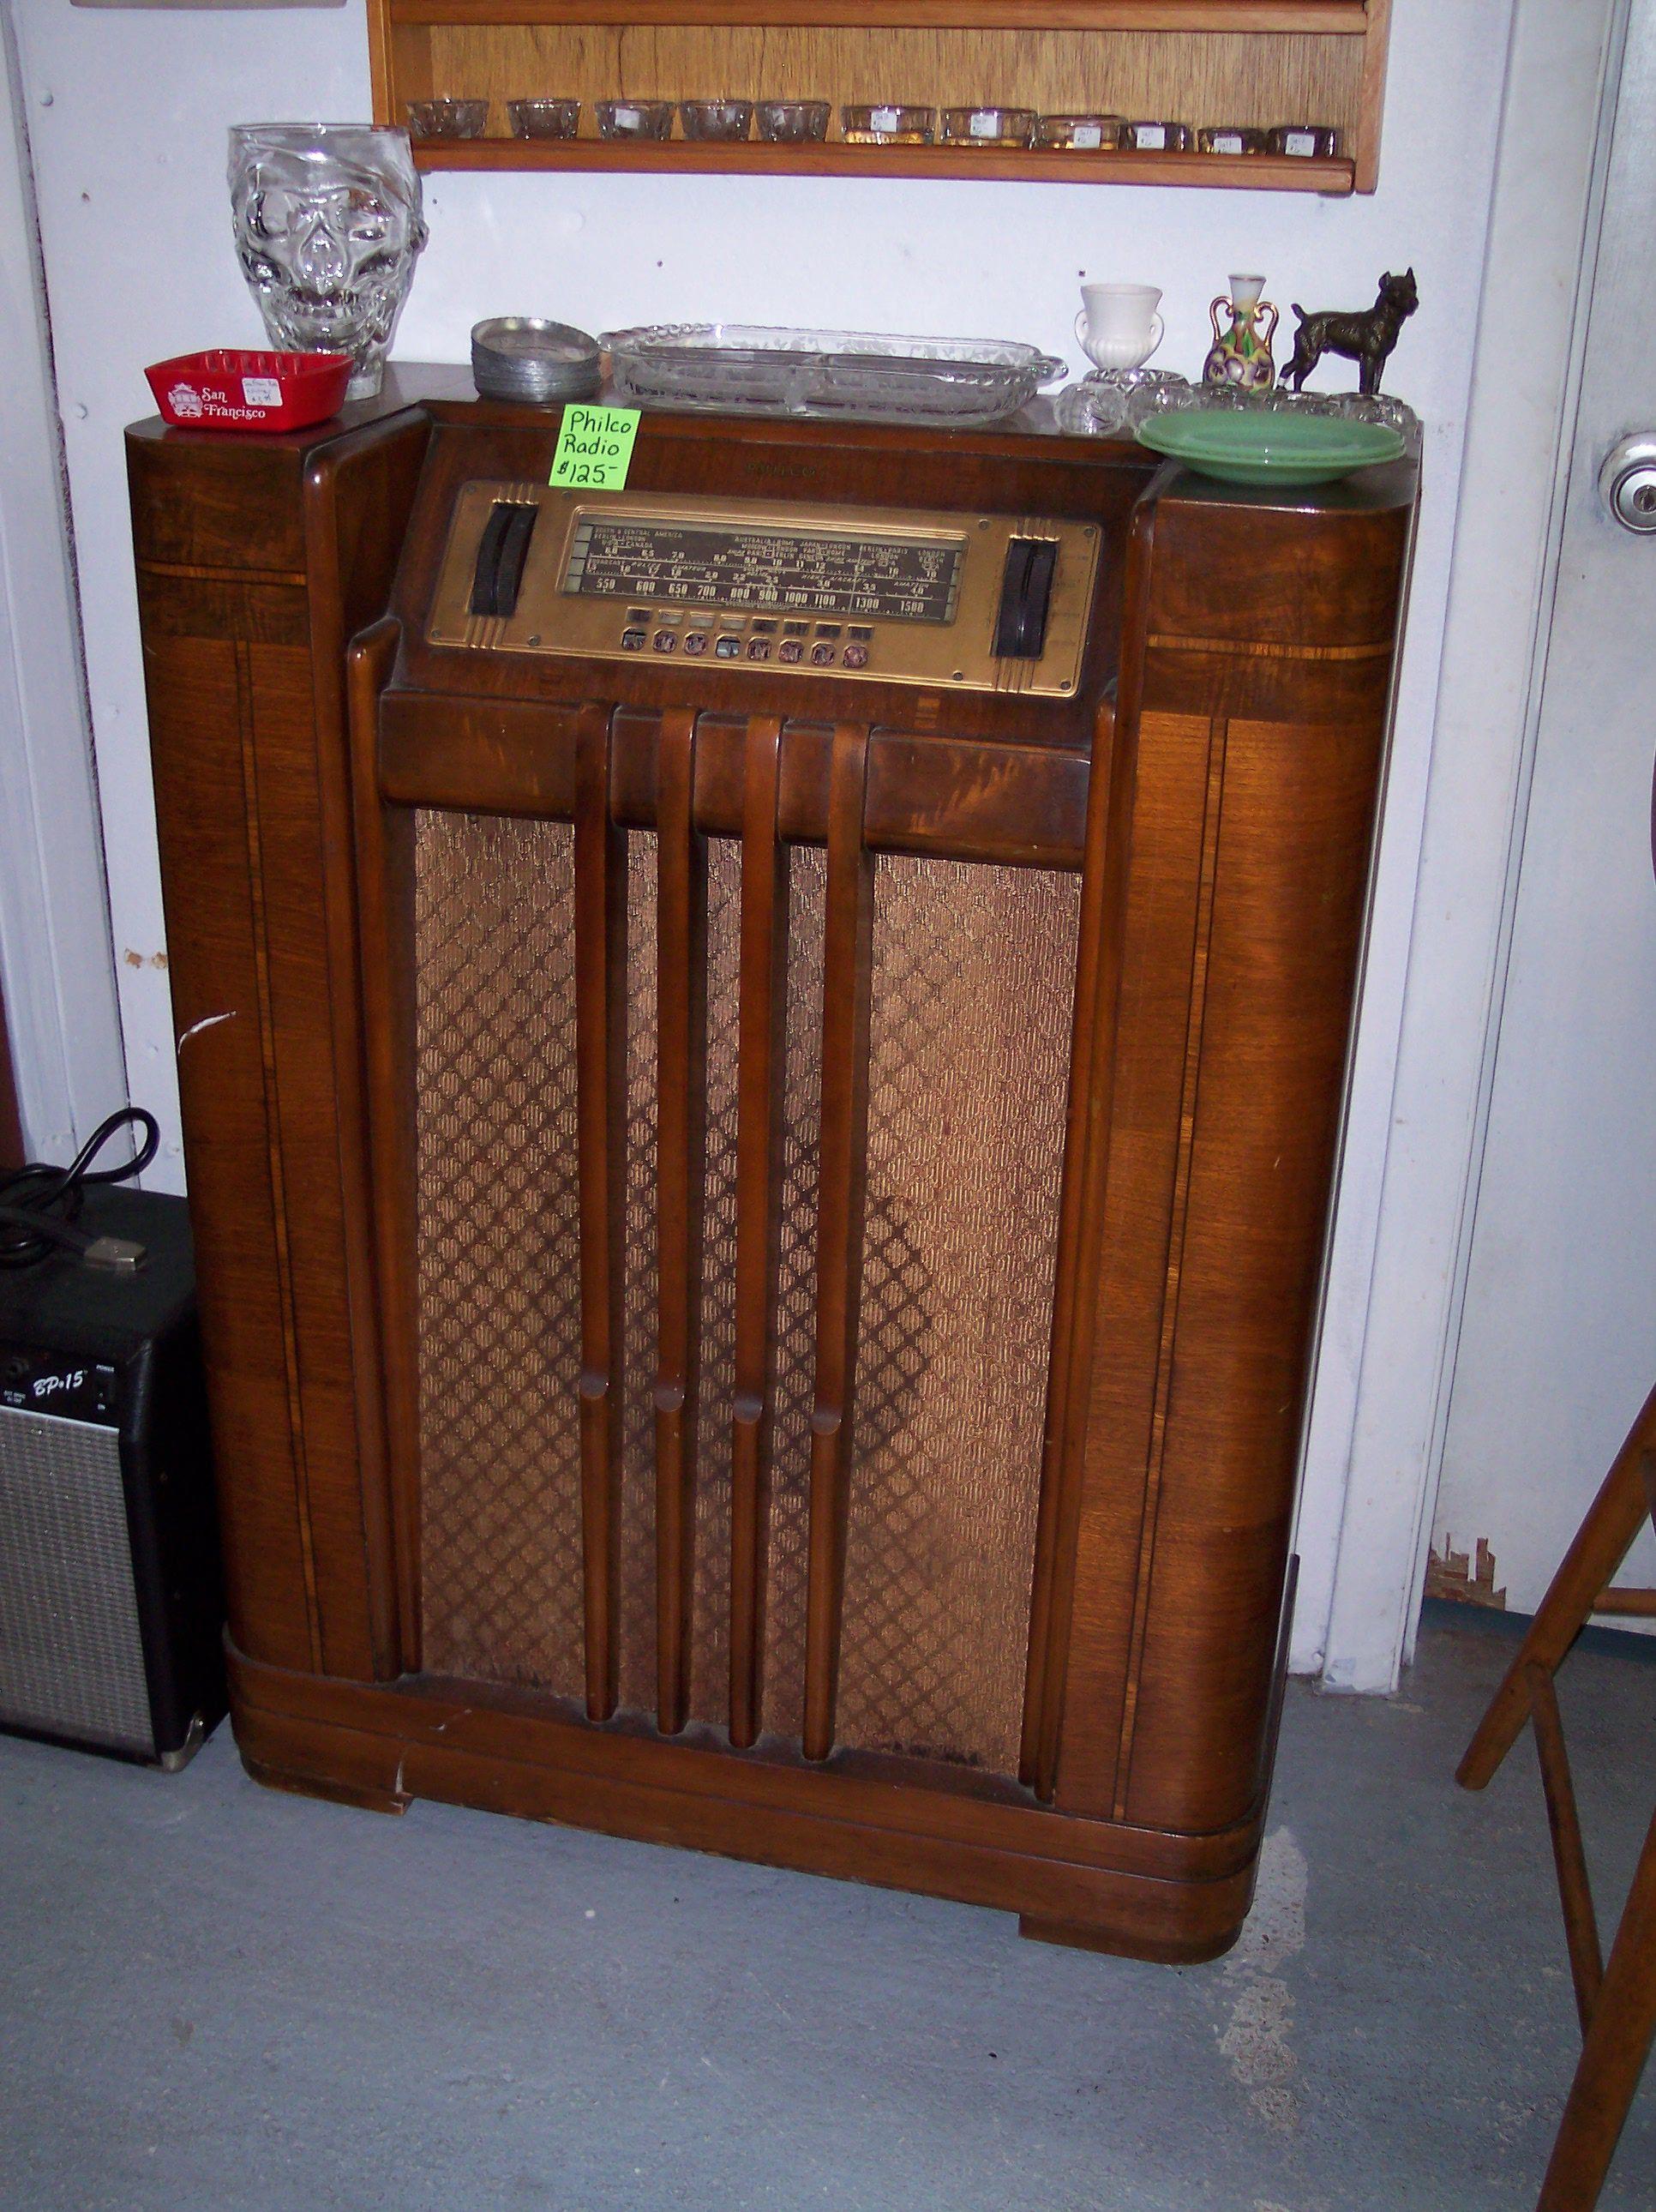 Philco Radio Console Radios Vintage Antique